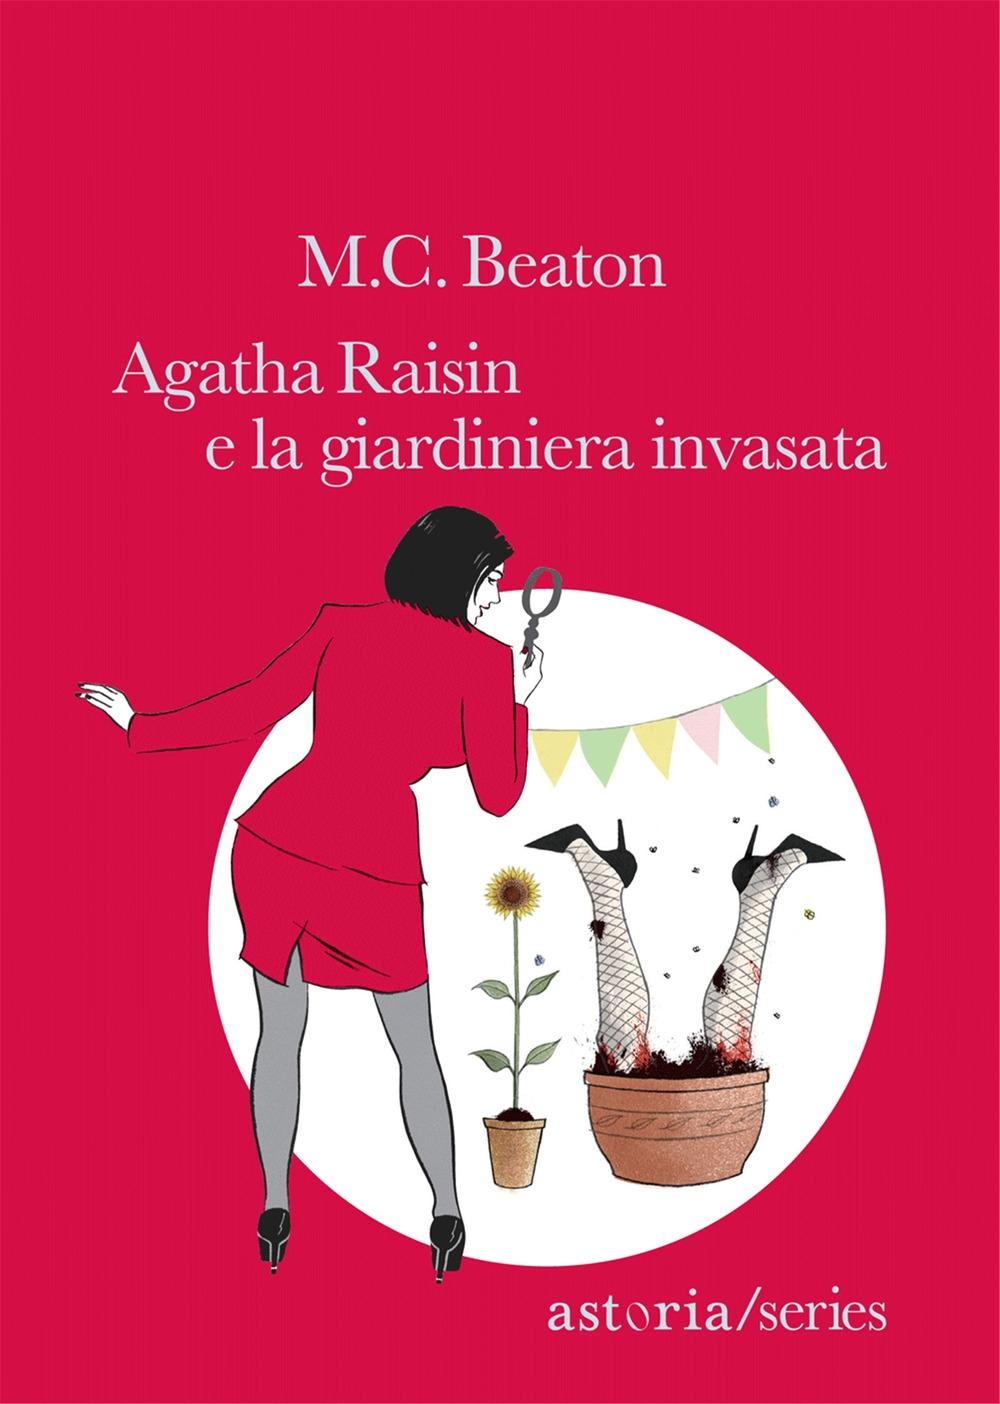 Agatha Raisin e la giardiniera invasata